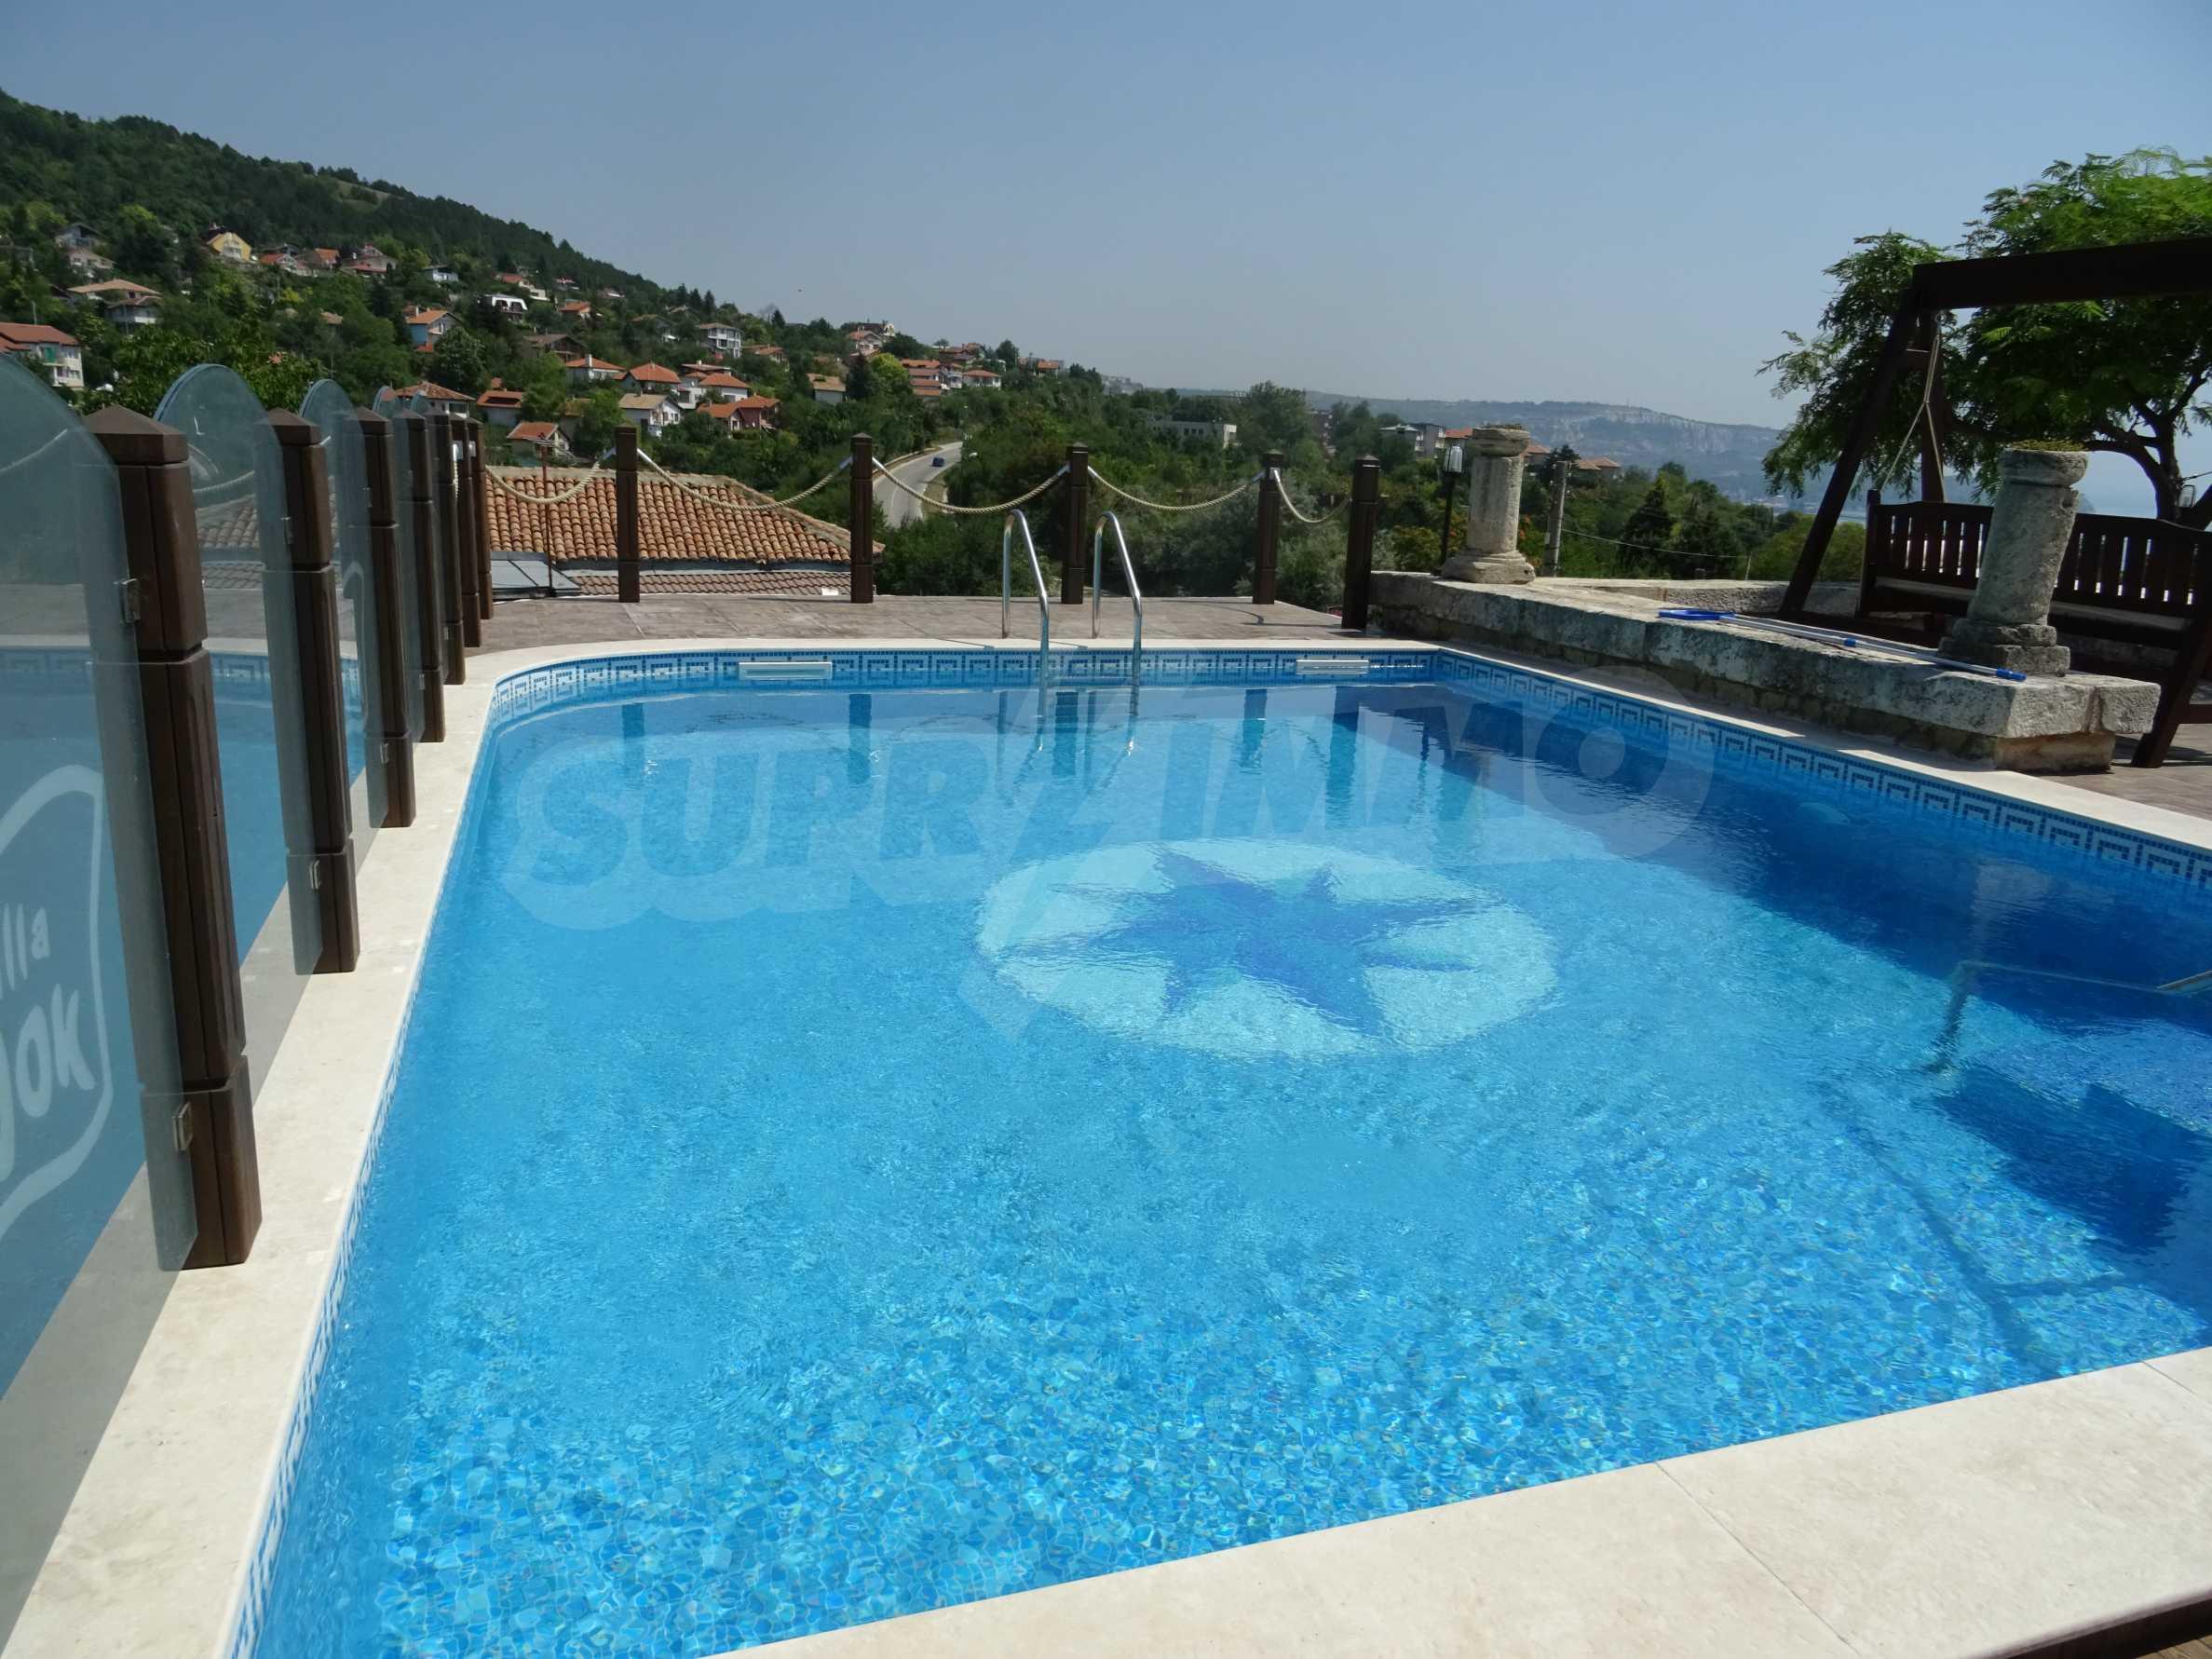 The Mediterranean style - a sense of luxury 4